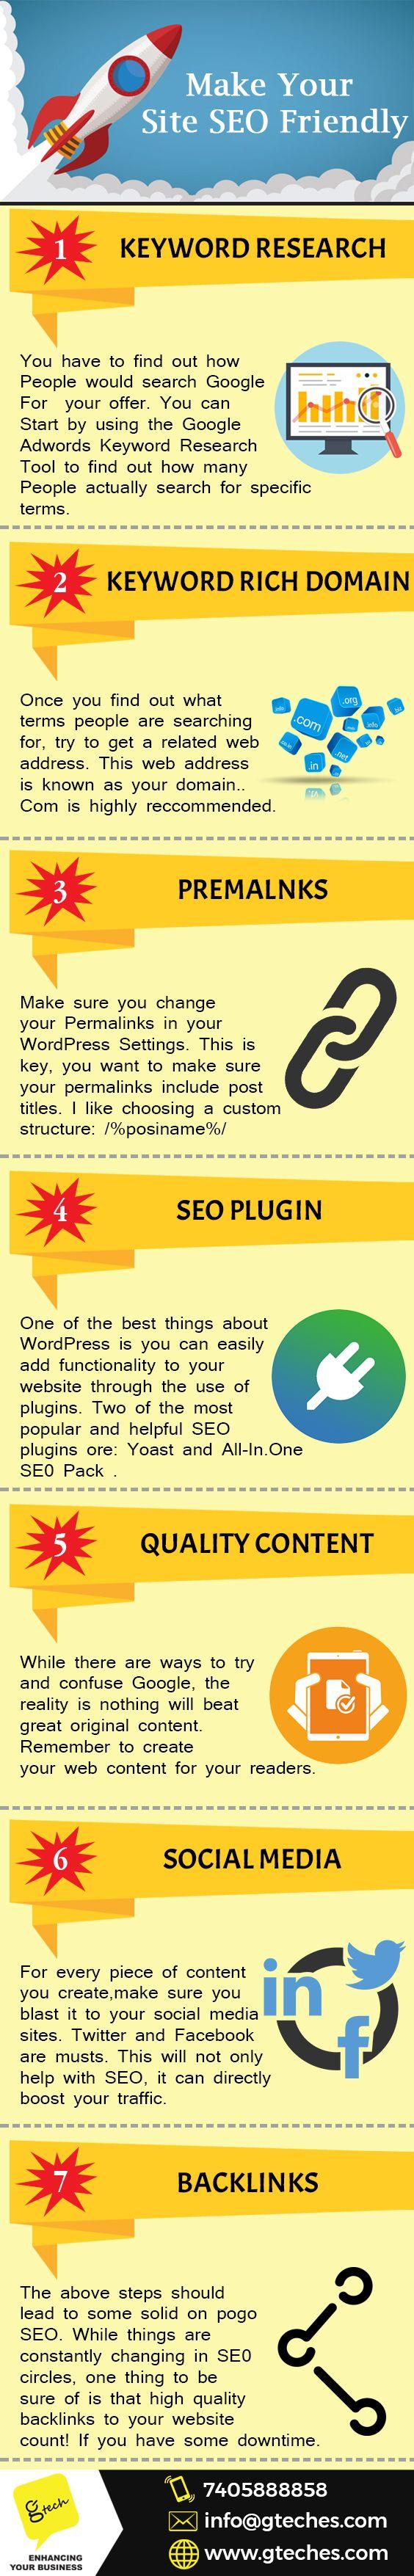 #infografia #infographic #gtech #seo #friendly #Top 10 Web Design Companies in India  #web design company  #top web development companies in India  #web development company